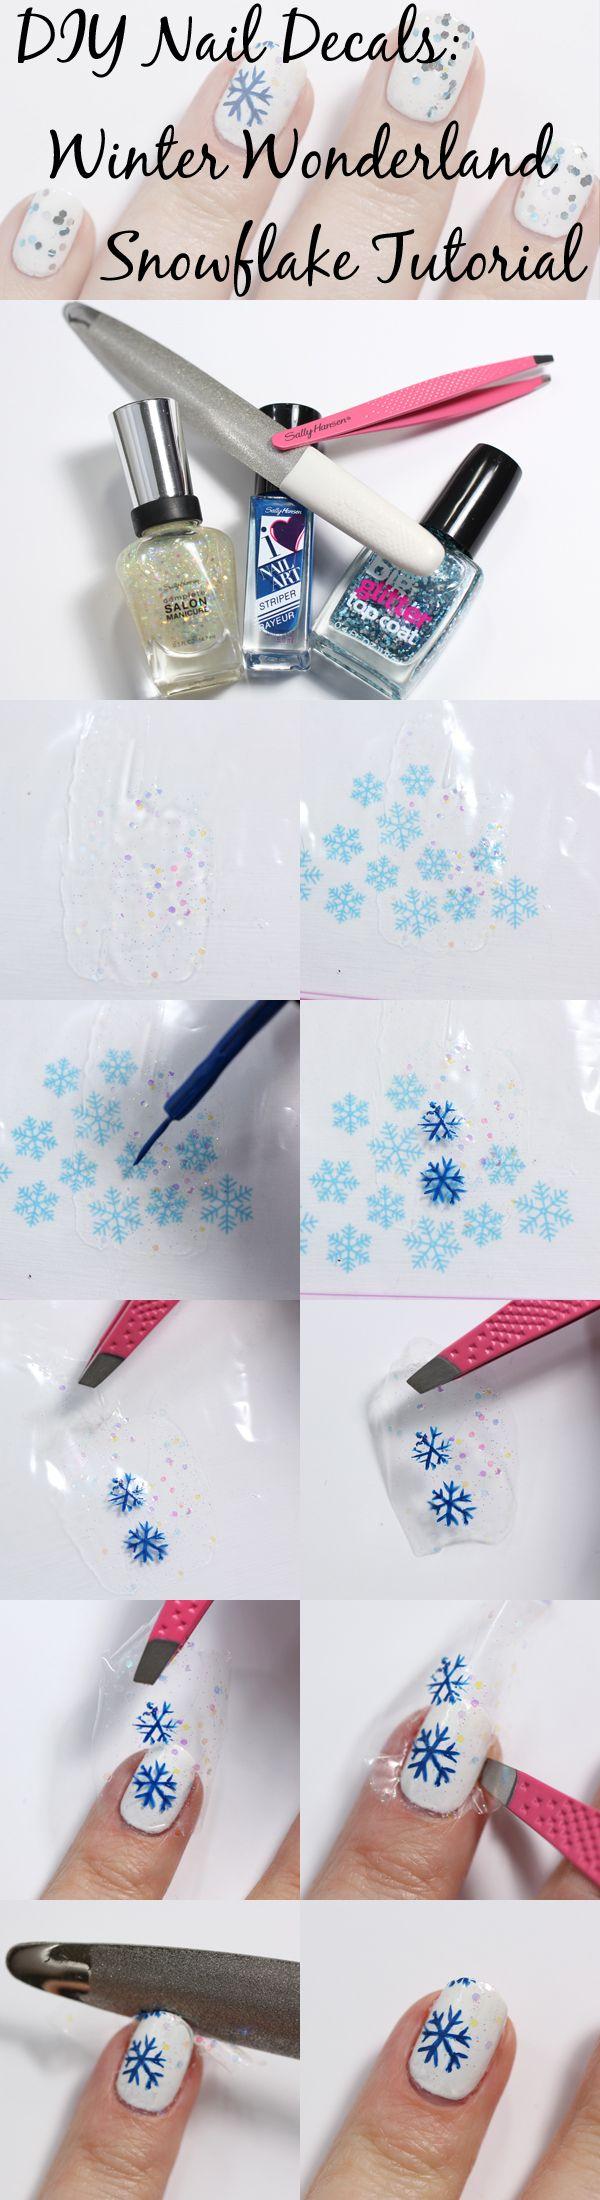 DIY Nail Decal Tutorial - Snowflakes via @alllacqueredup